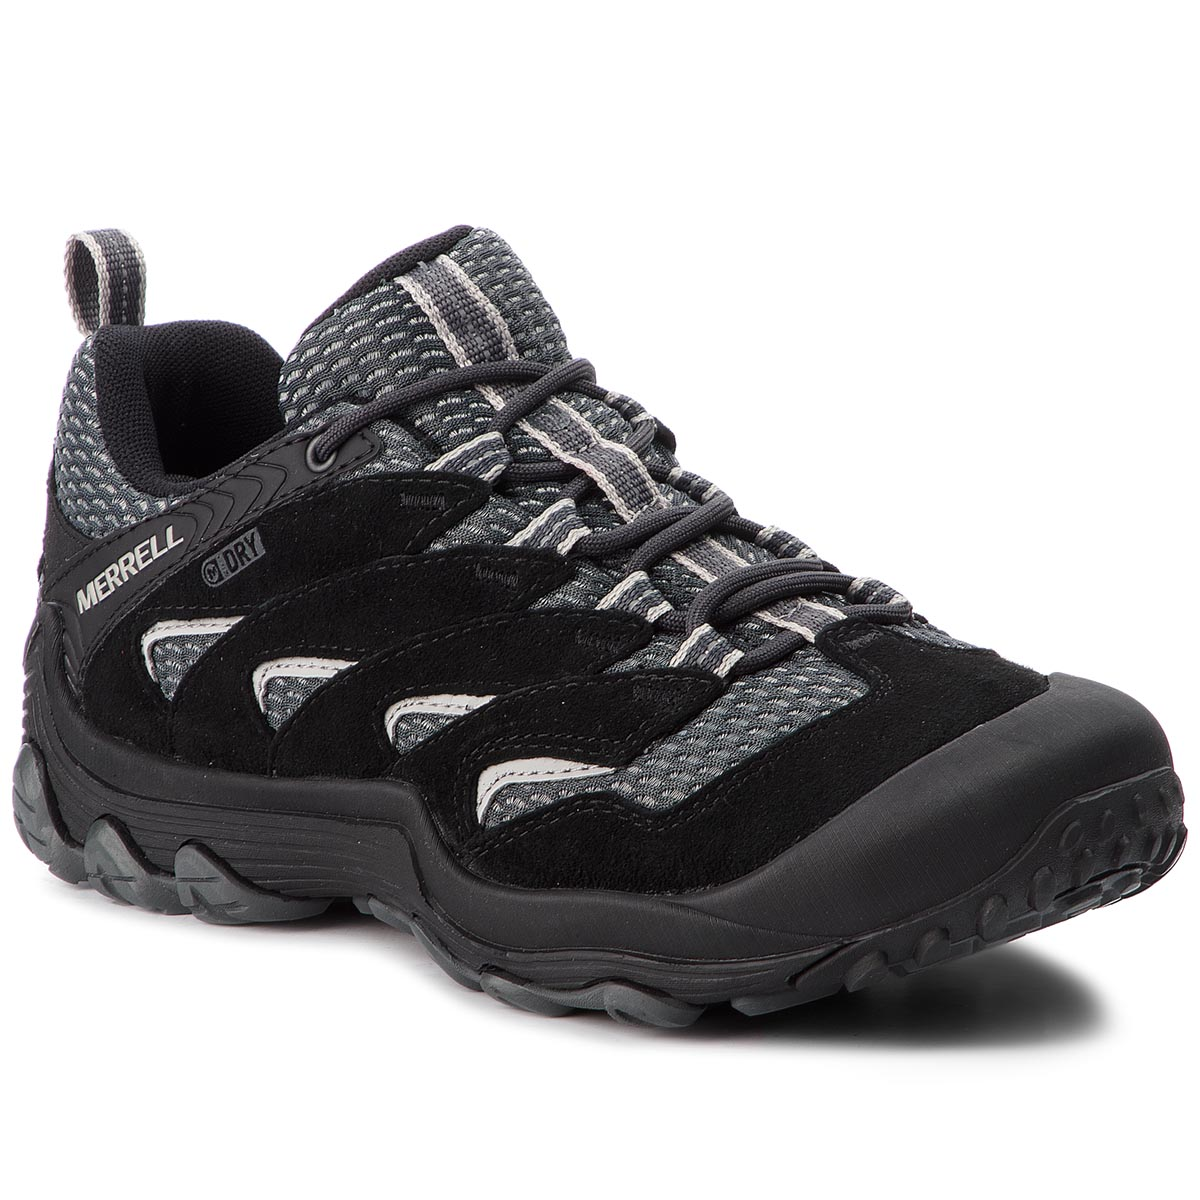 Trekingová obuv MERRELL - Cham 7 Limit Wp J12775 Black